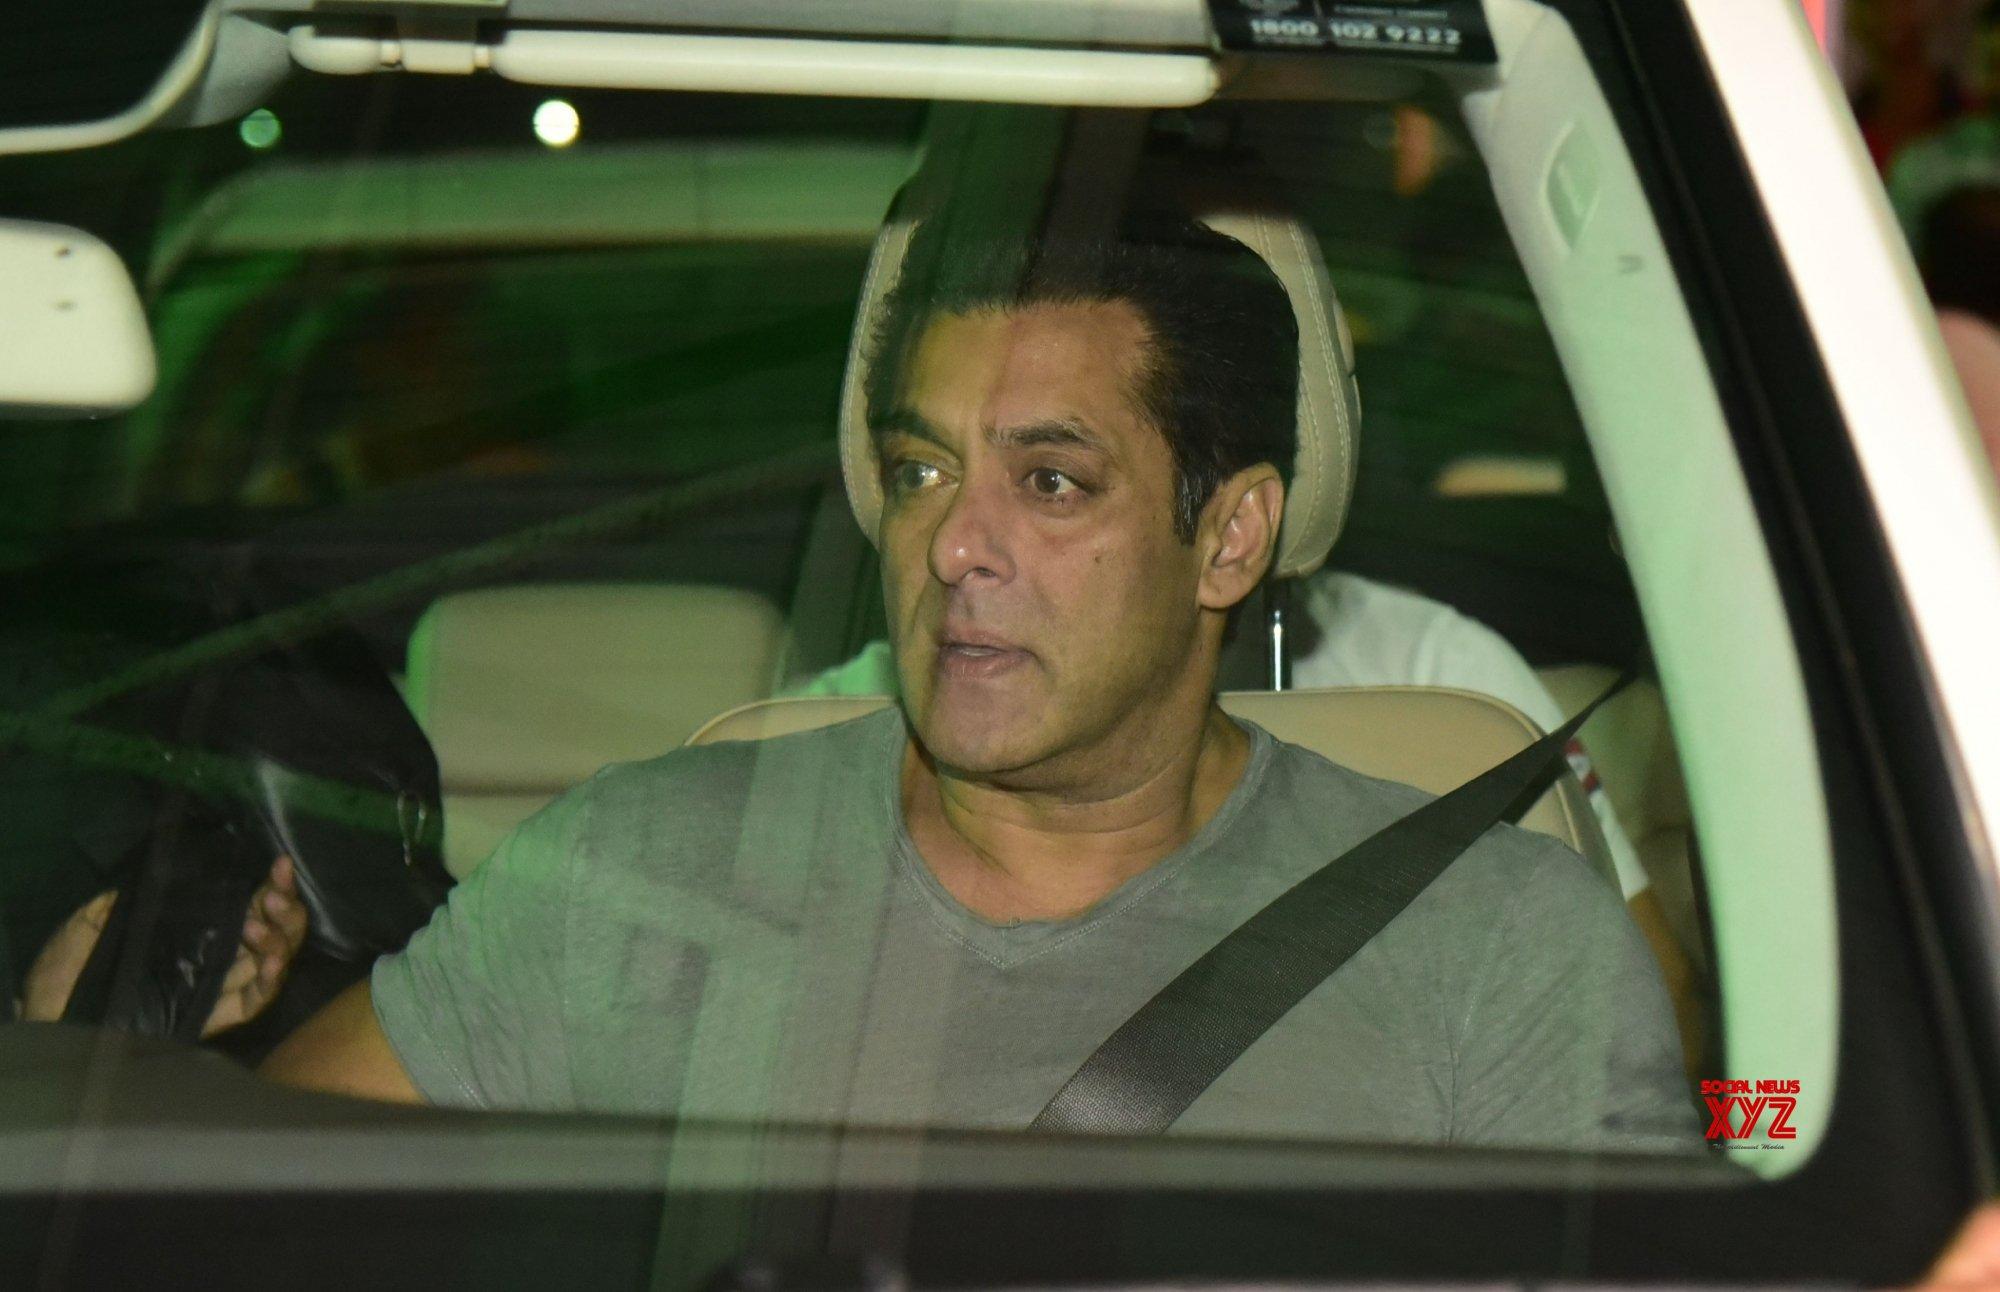 Jaipur: Salman Khan arrives in city #Gallery